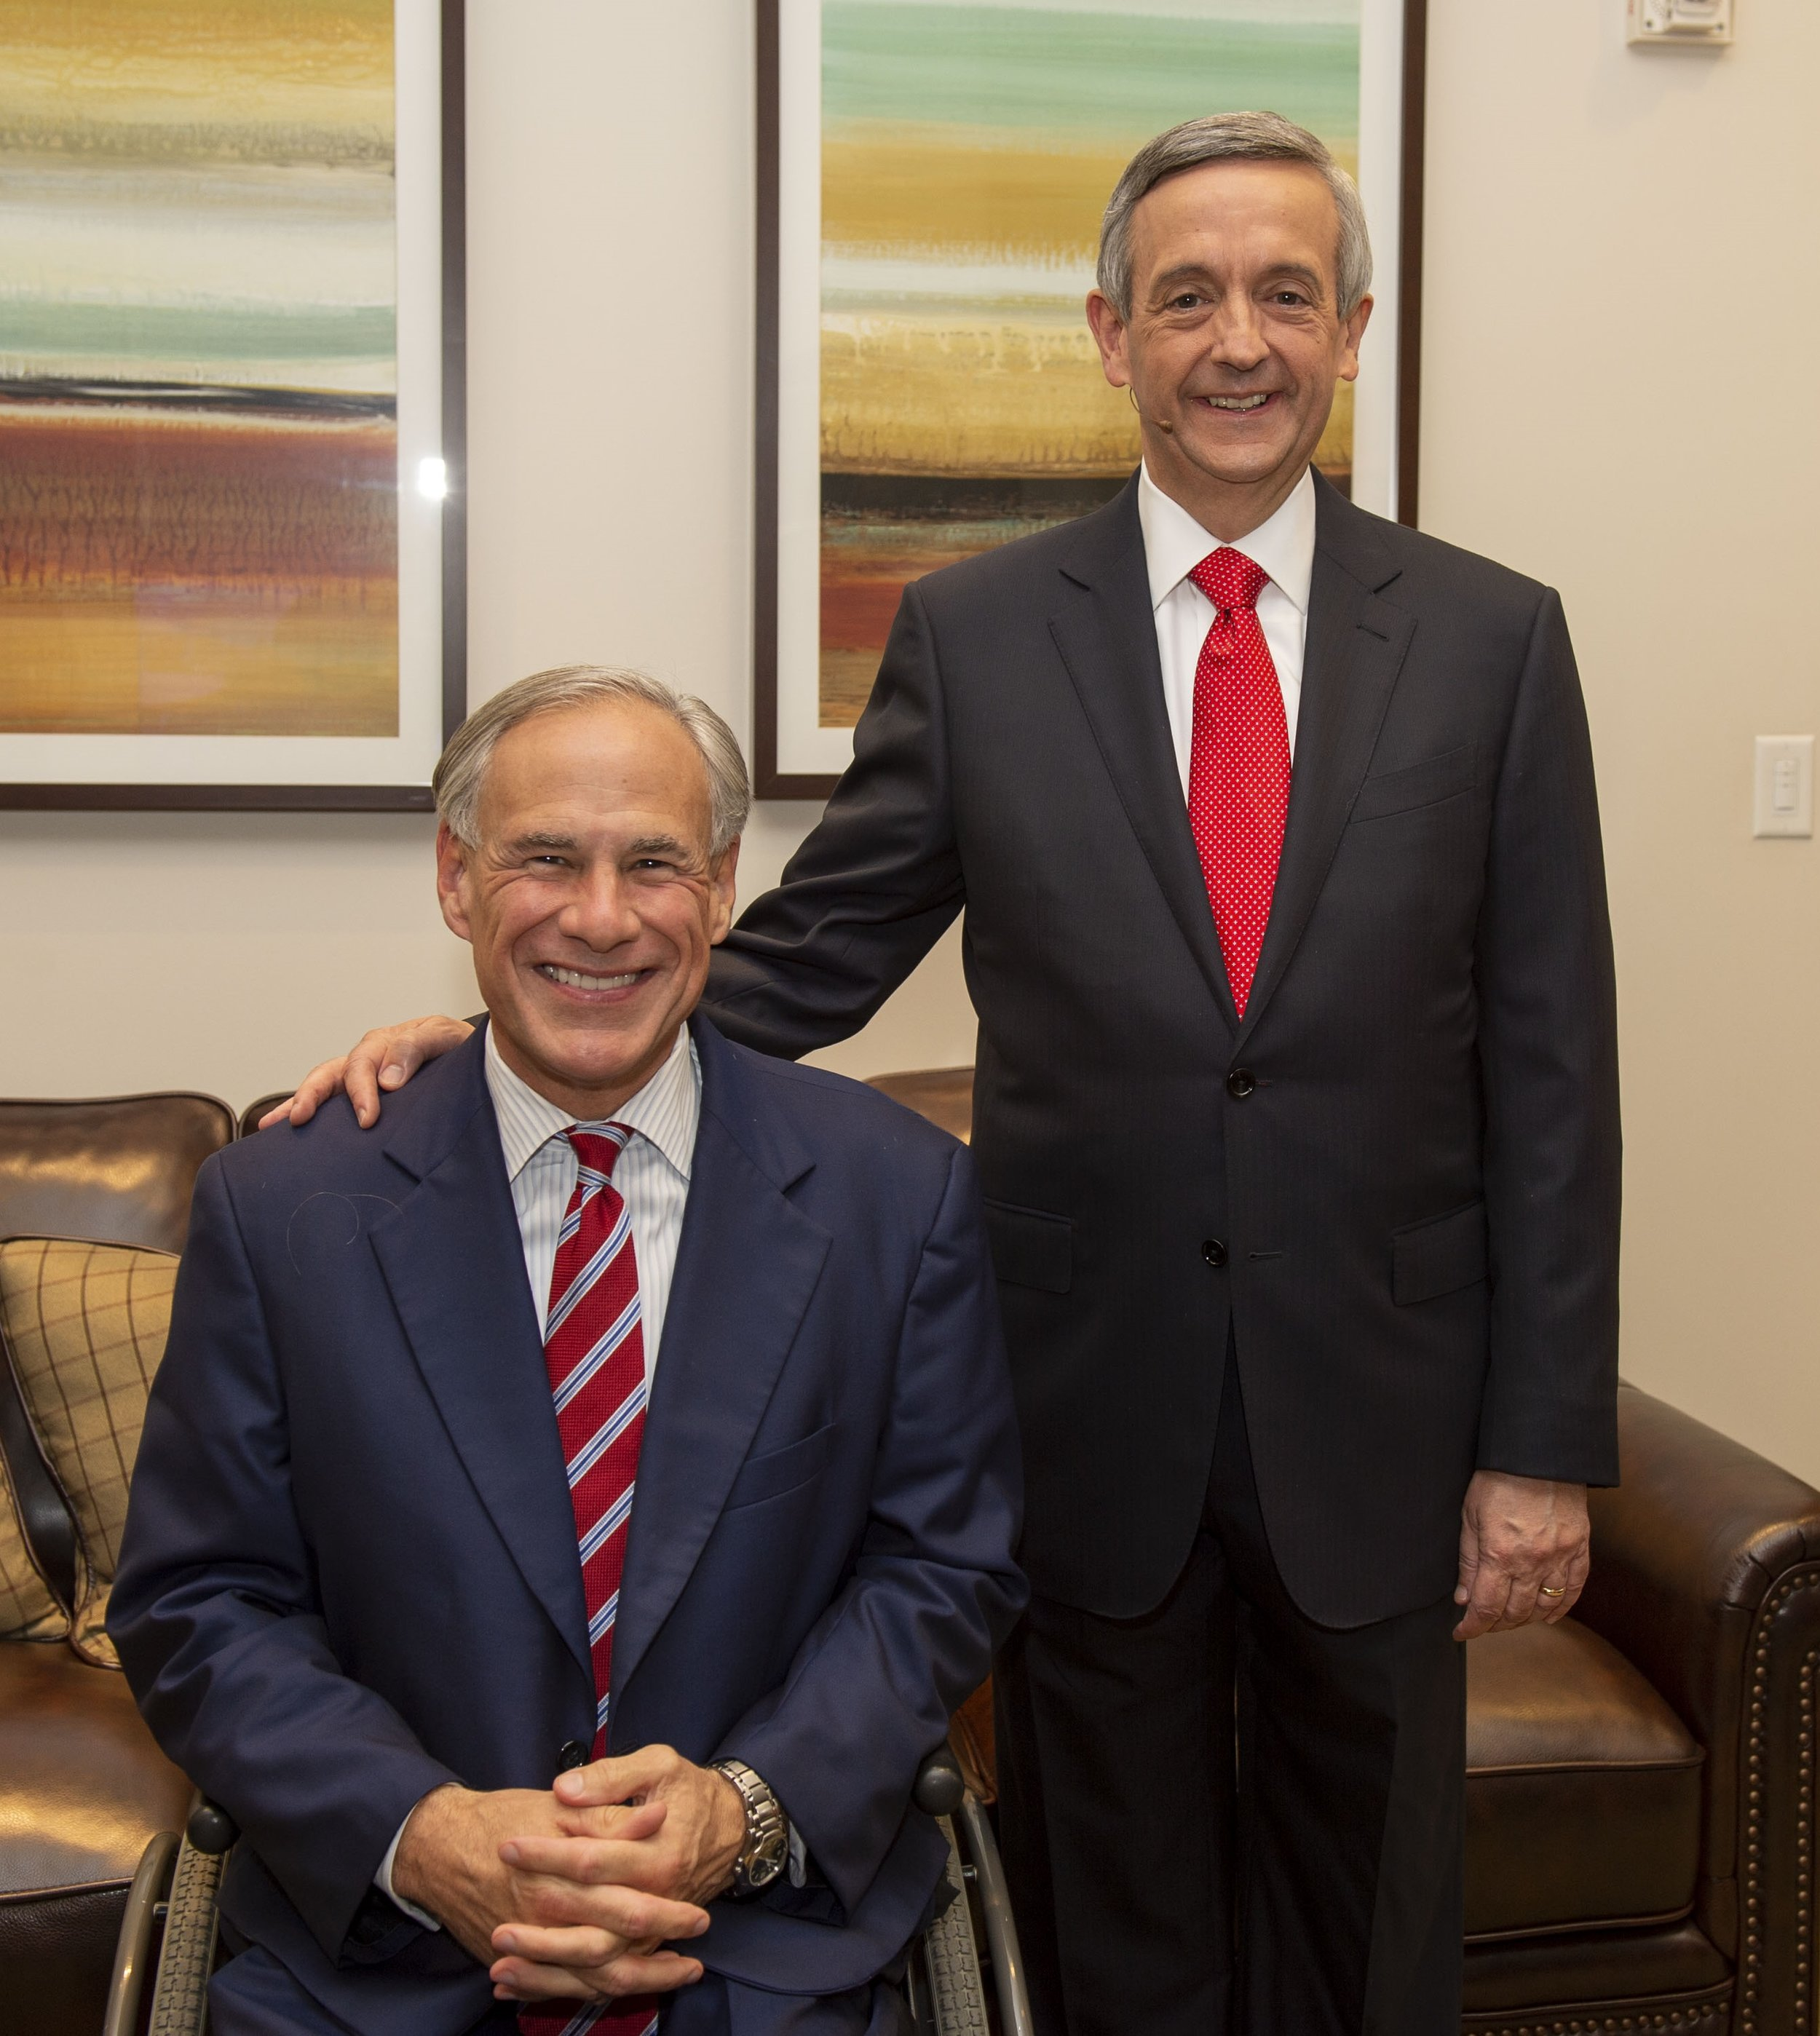 First Dallas Senior Pastor Dr. Robert Jeffress with Texas Gov. Greg Abbott